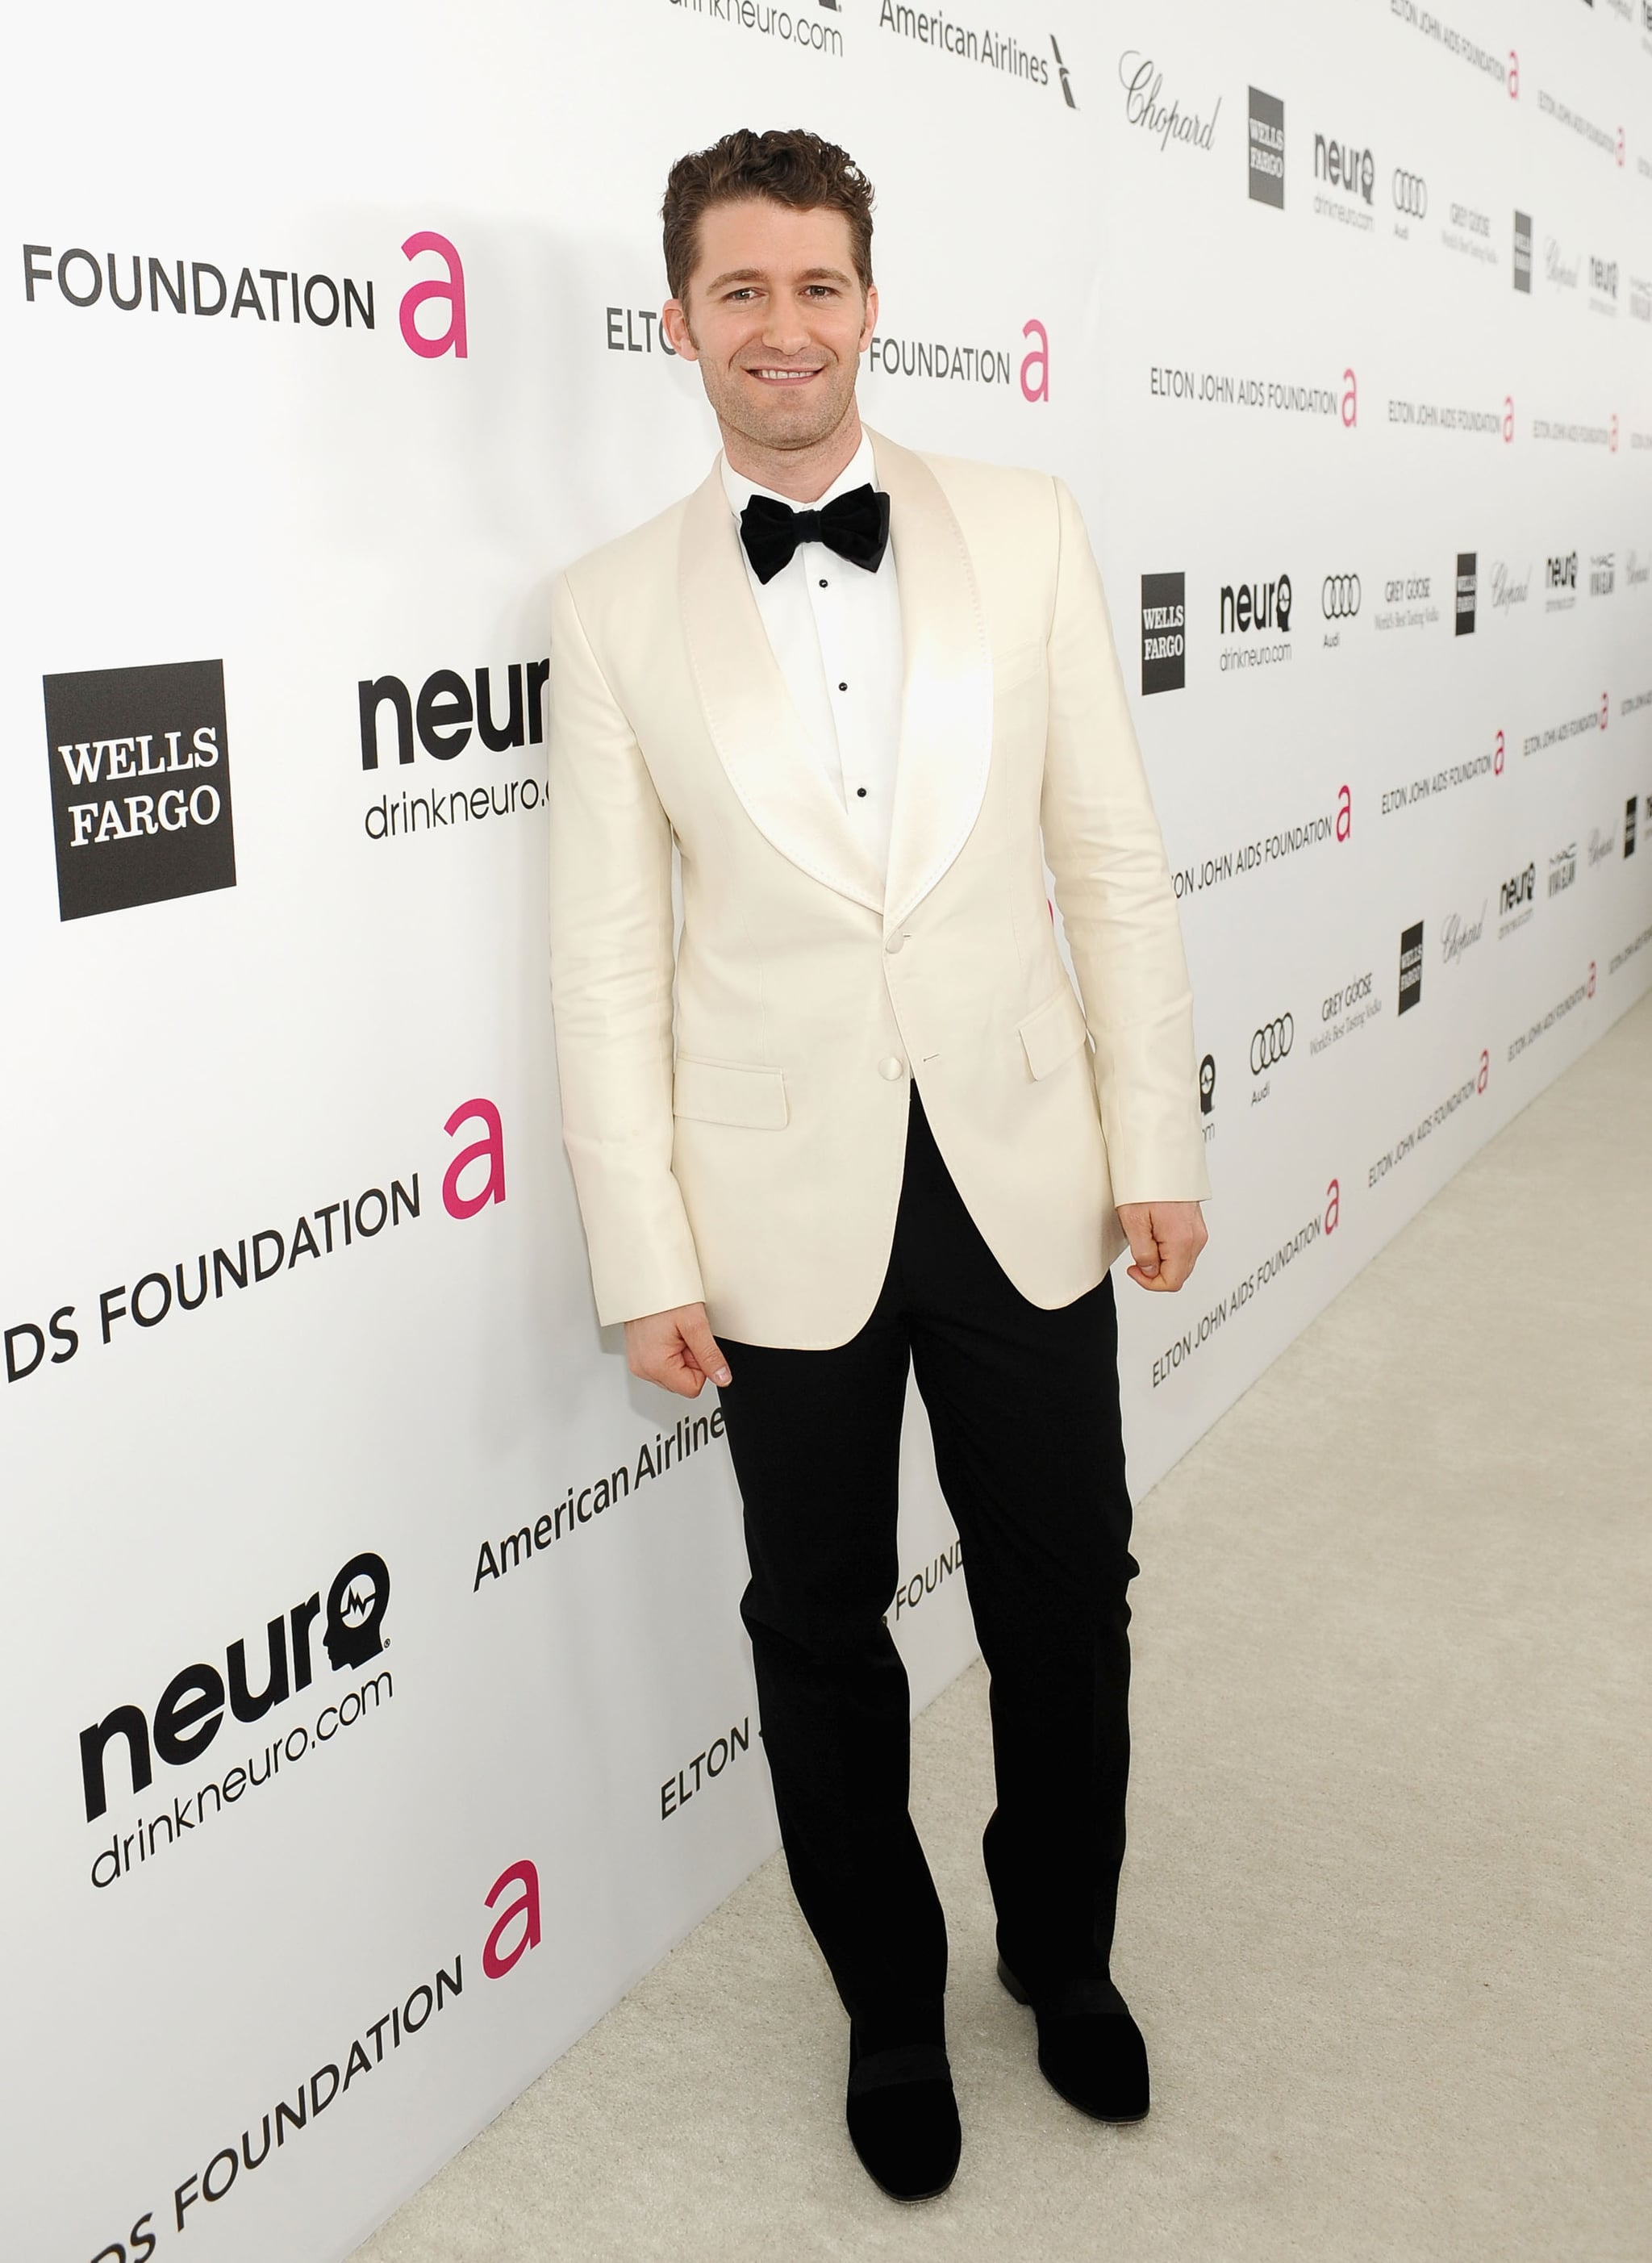 Matthew Morrison wore a white jacket to Elton John's Oscar party in LA.